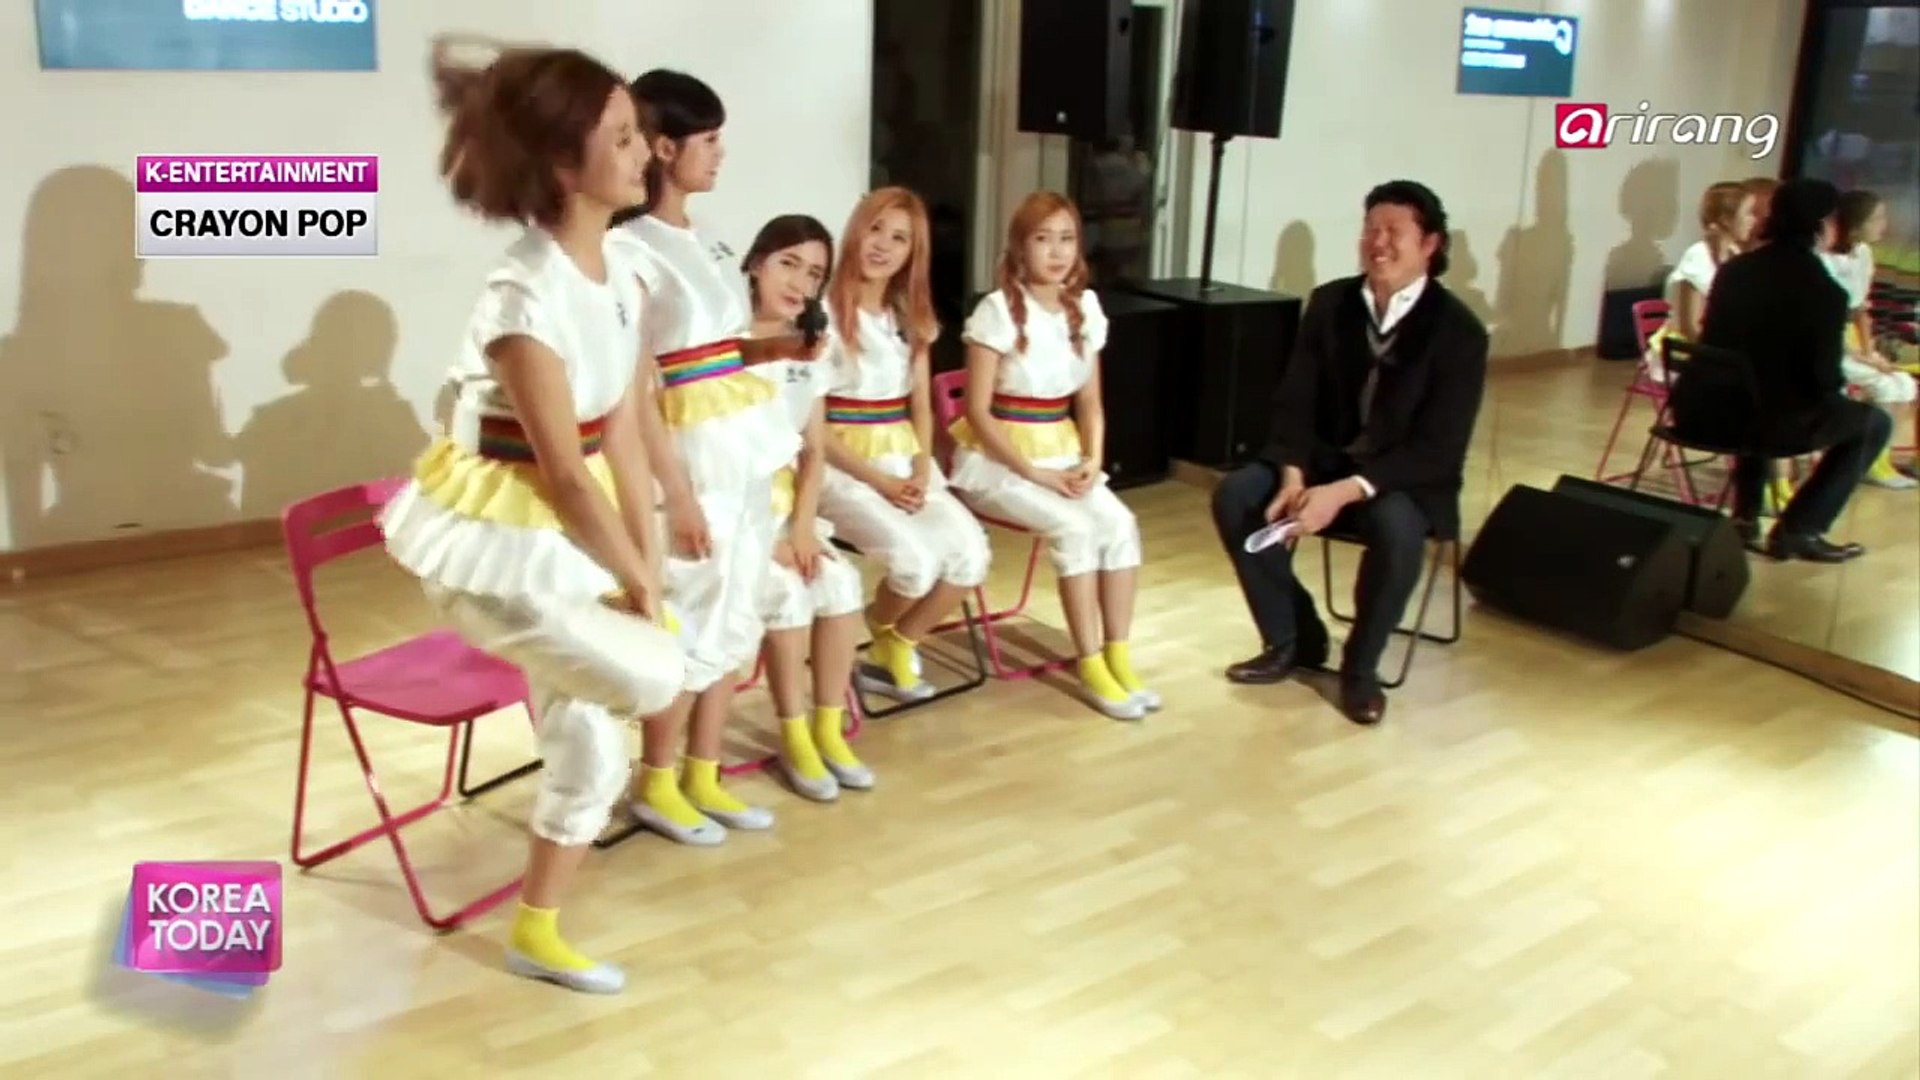 Korea Today - Crayon Pop Back with 'Uh-ee' 스타인터뷰 크레용팝